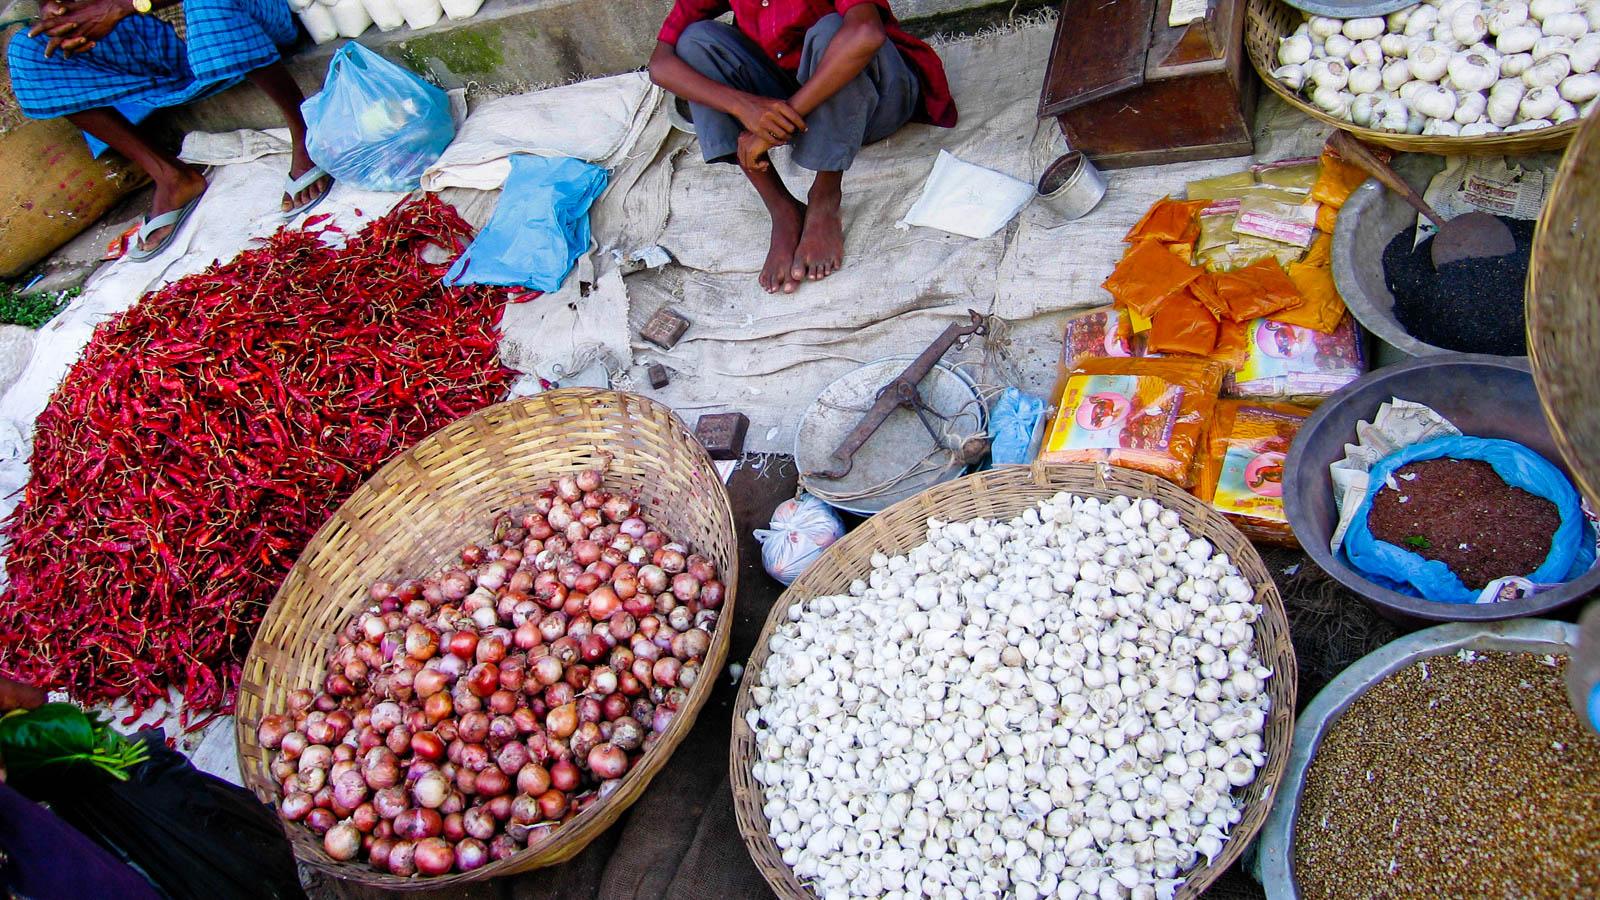 open-air farmer's market in Bangladesh